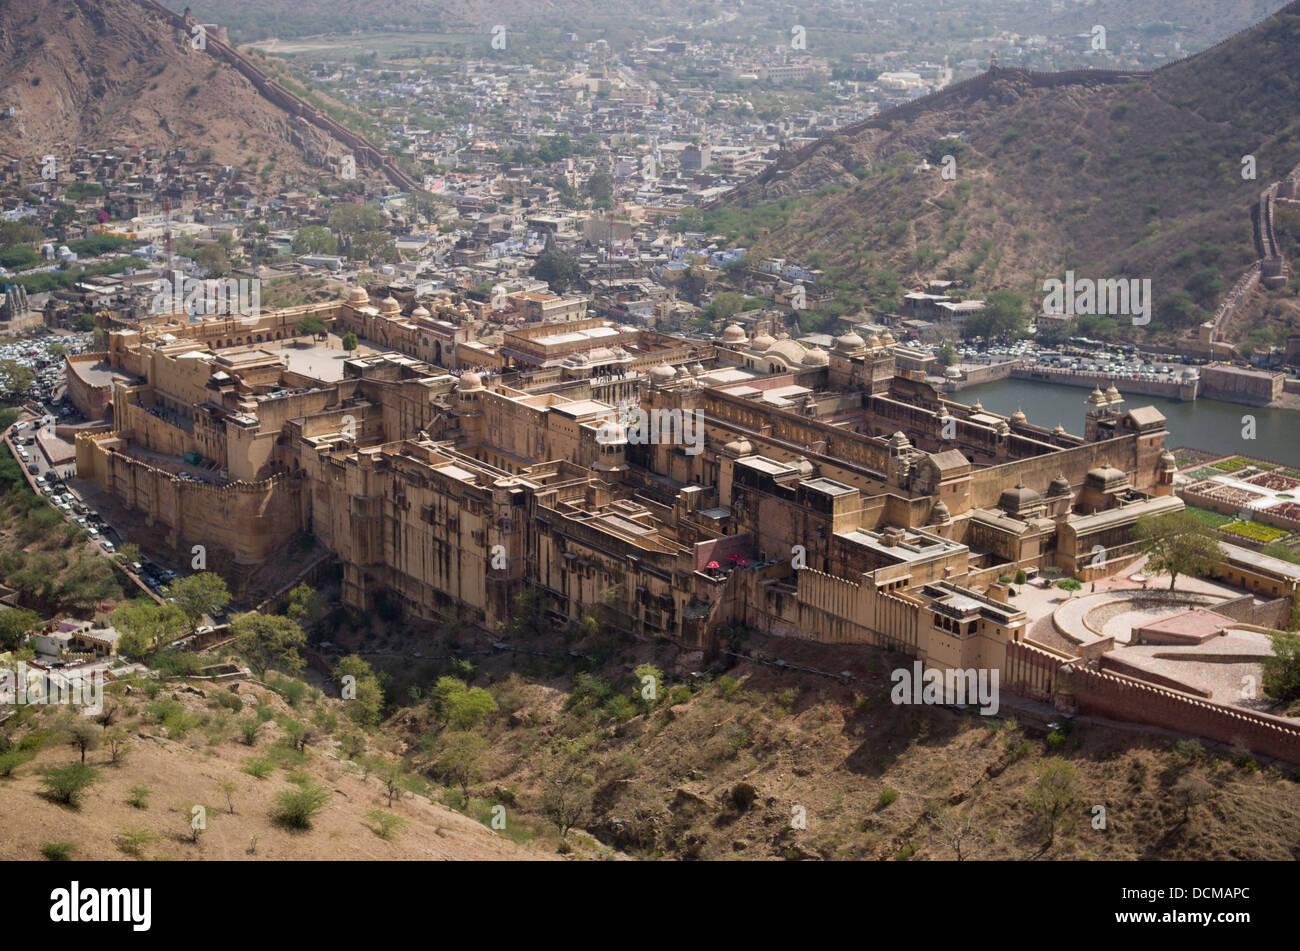 Amber ( Amer ) Fort / Palace - Jaipur, Rajasthan, India - Stock Image